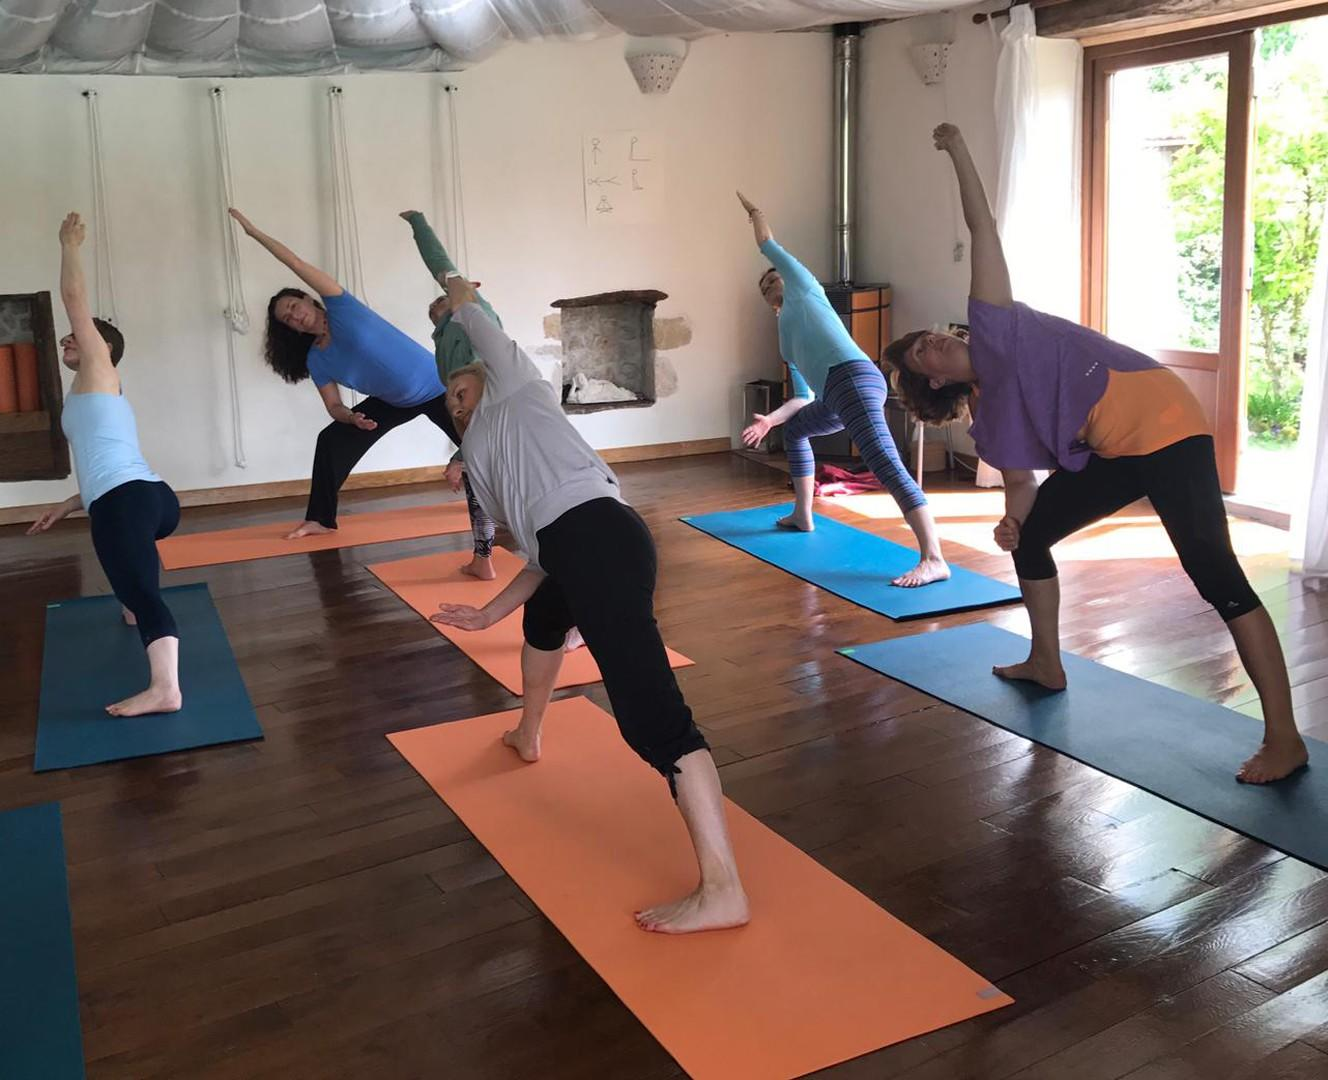 Mixed Ability Hatha Yoga Class at St. Augustine's Church, Croydon